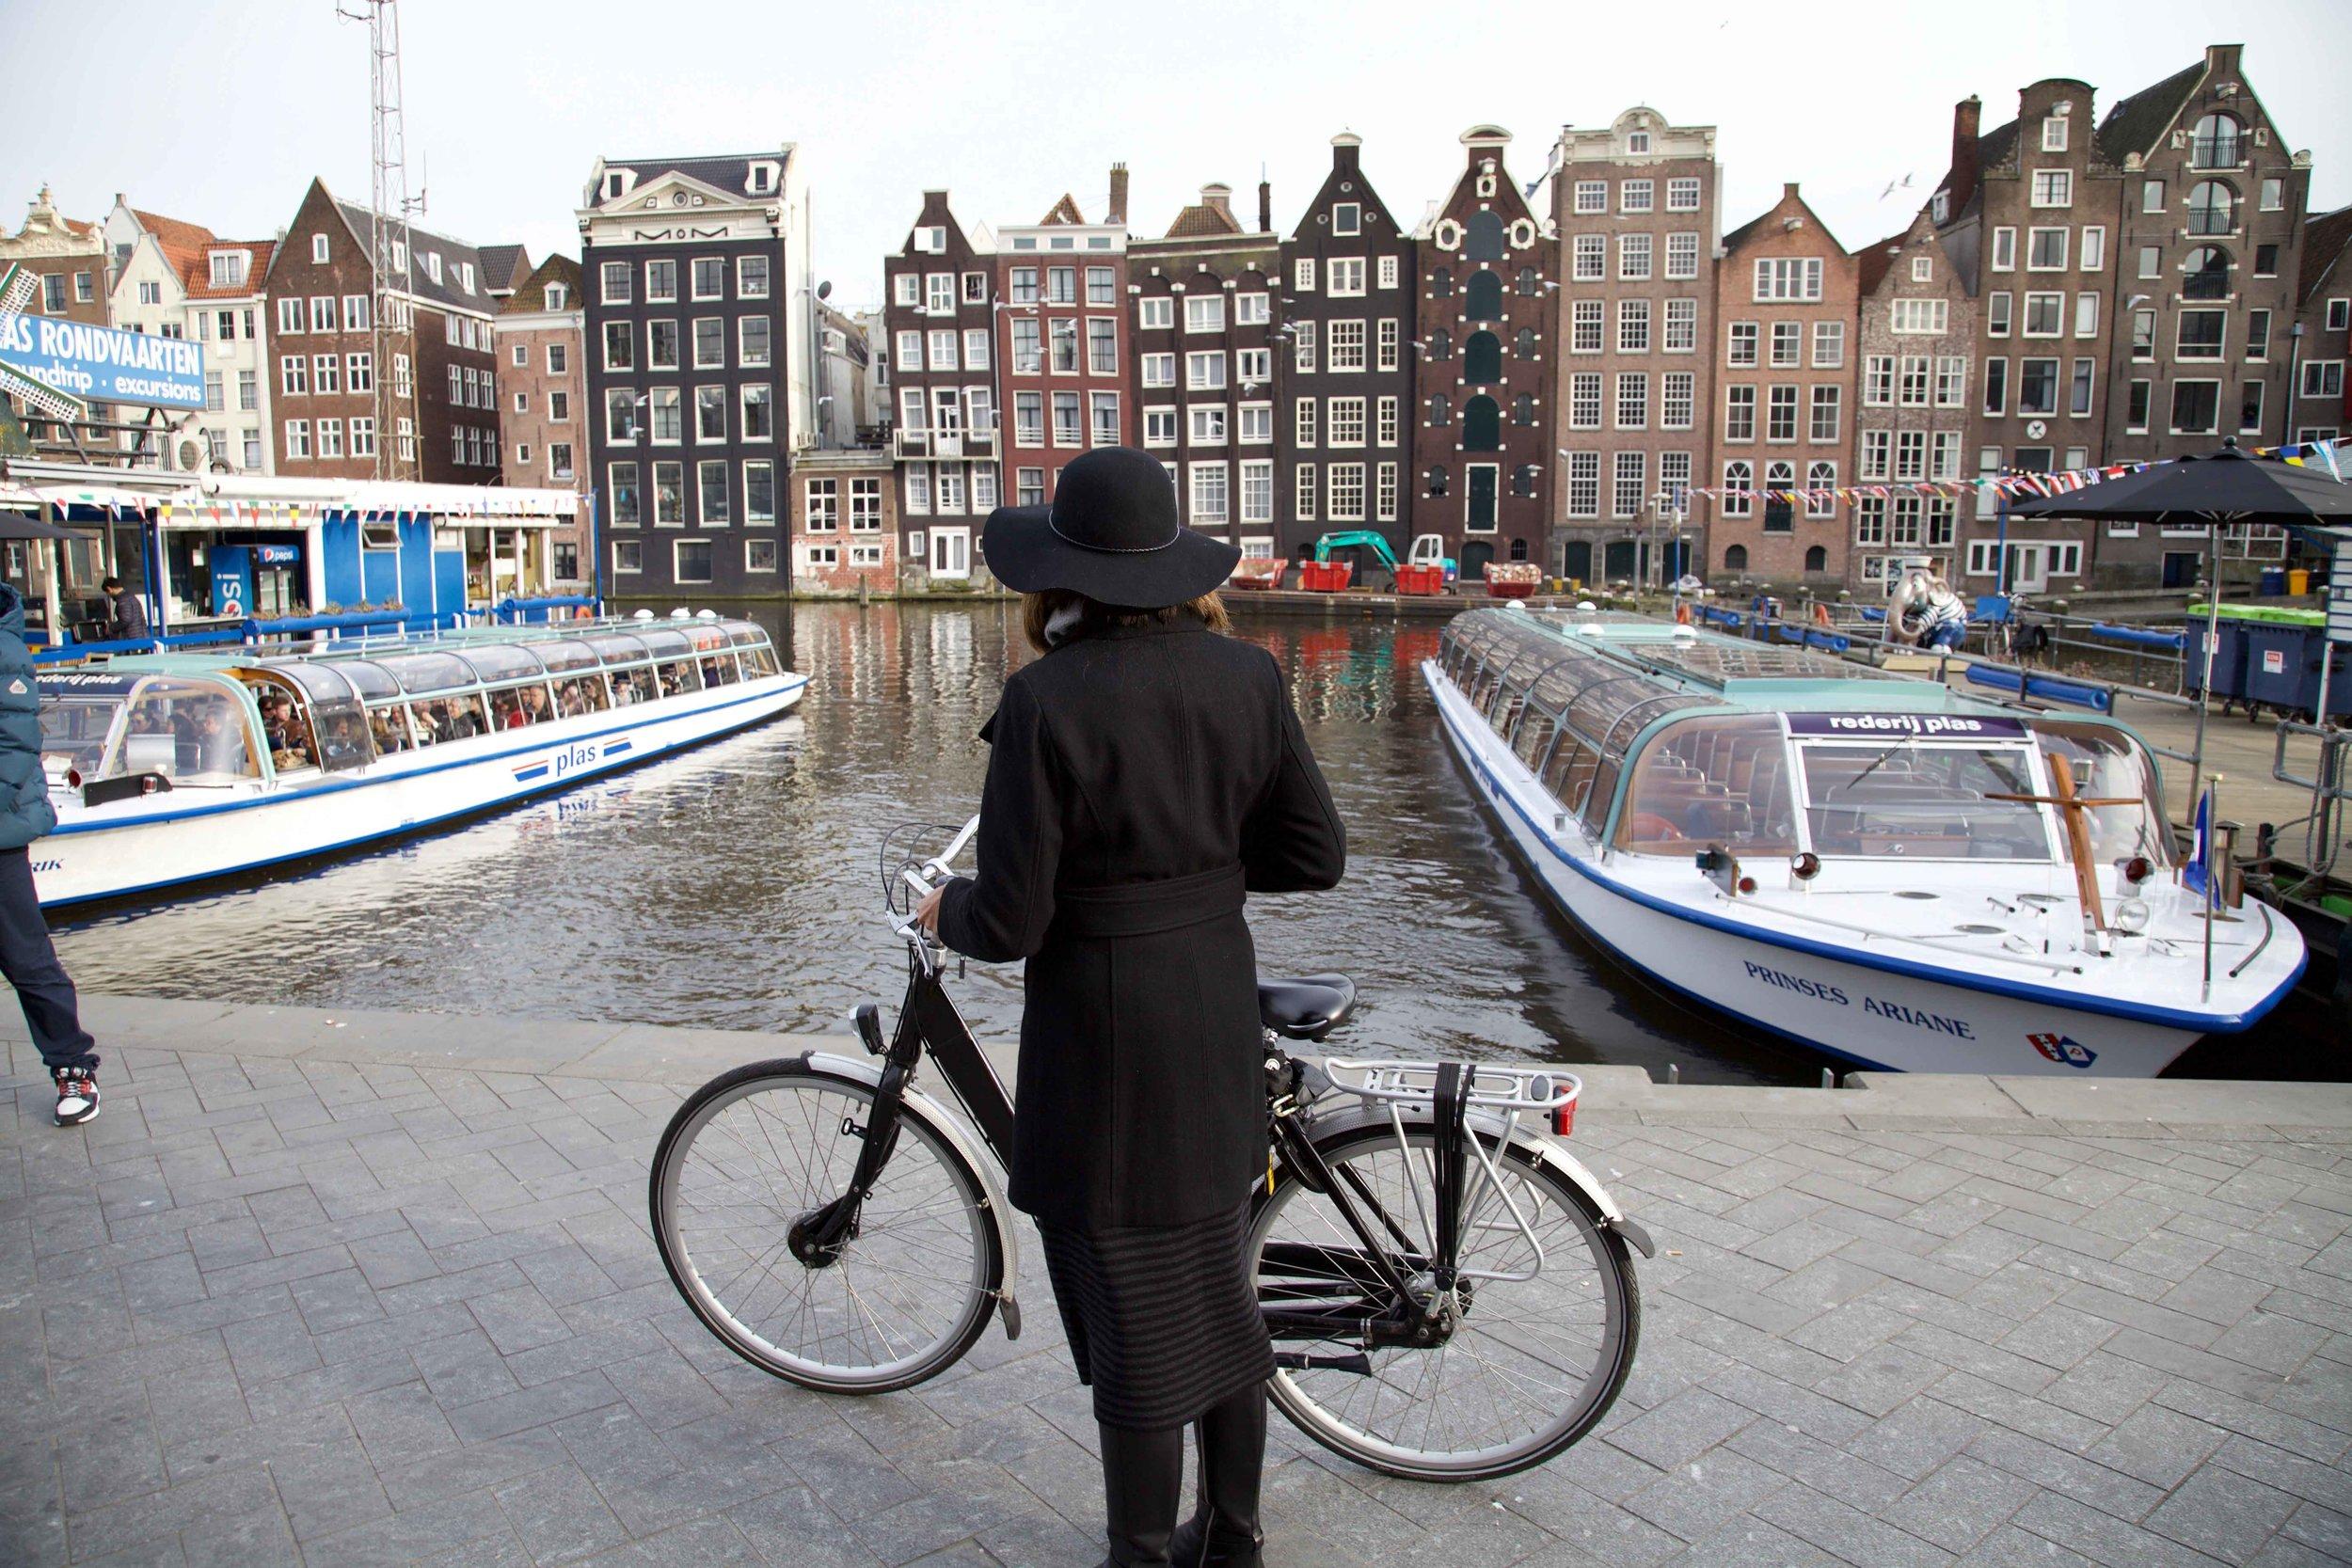 Canal near Amsterdam Centraal, train station, Amsterdam. Photo: Fabio Ricci. Image©thingstodot.com